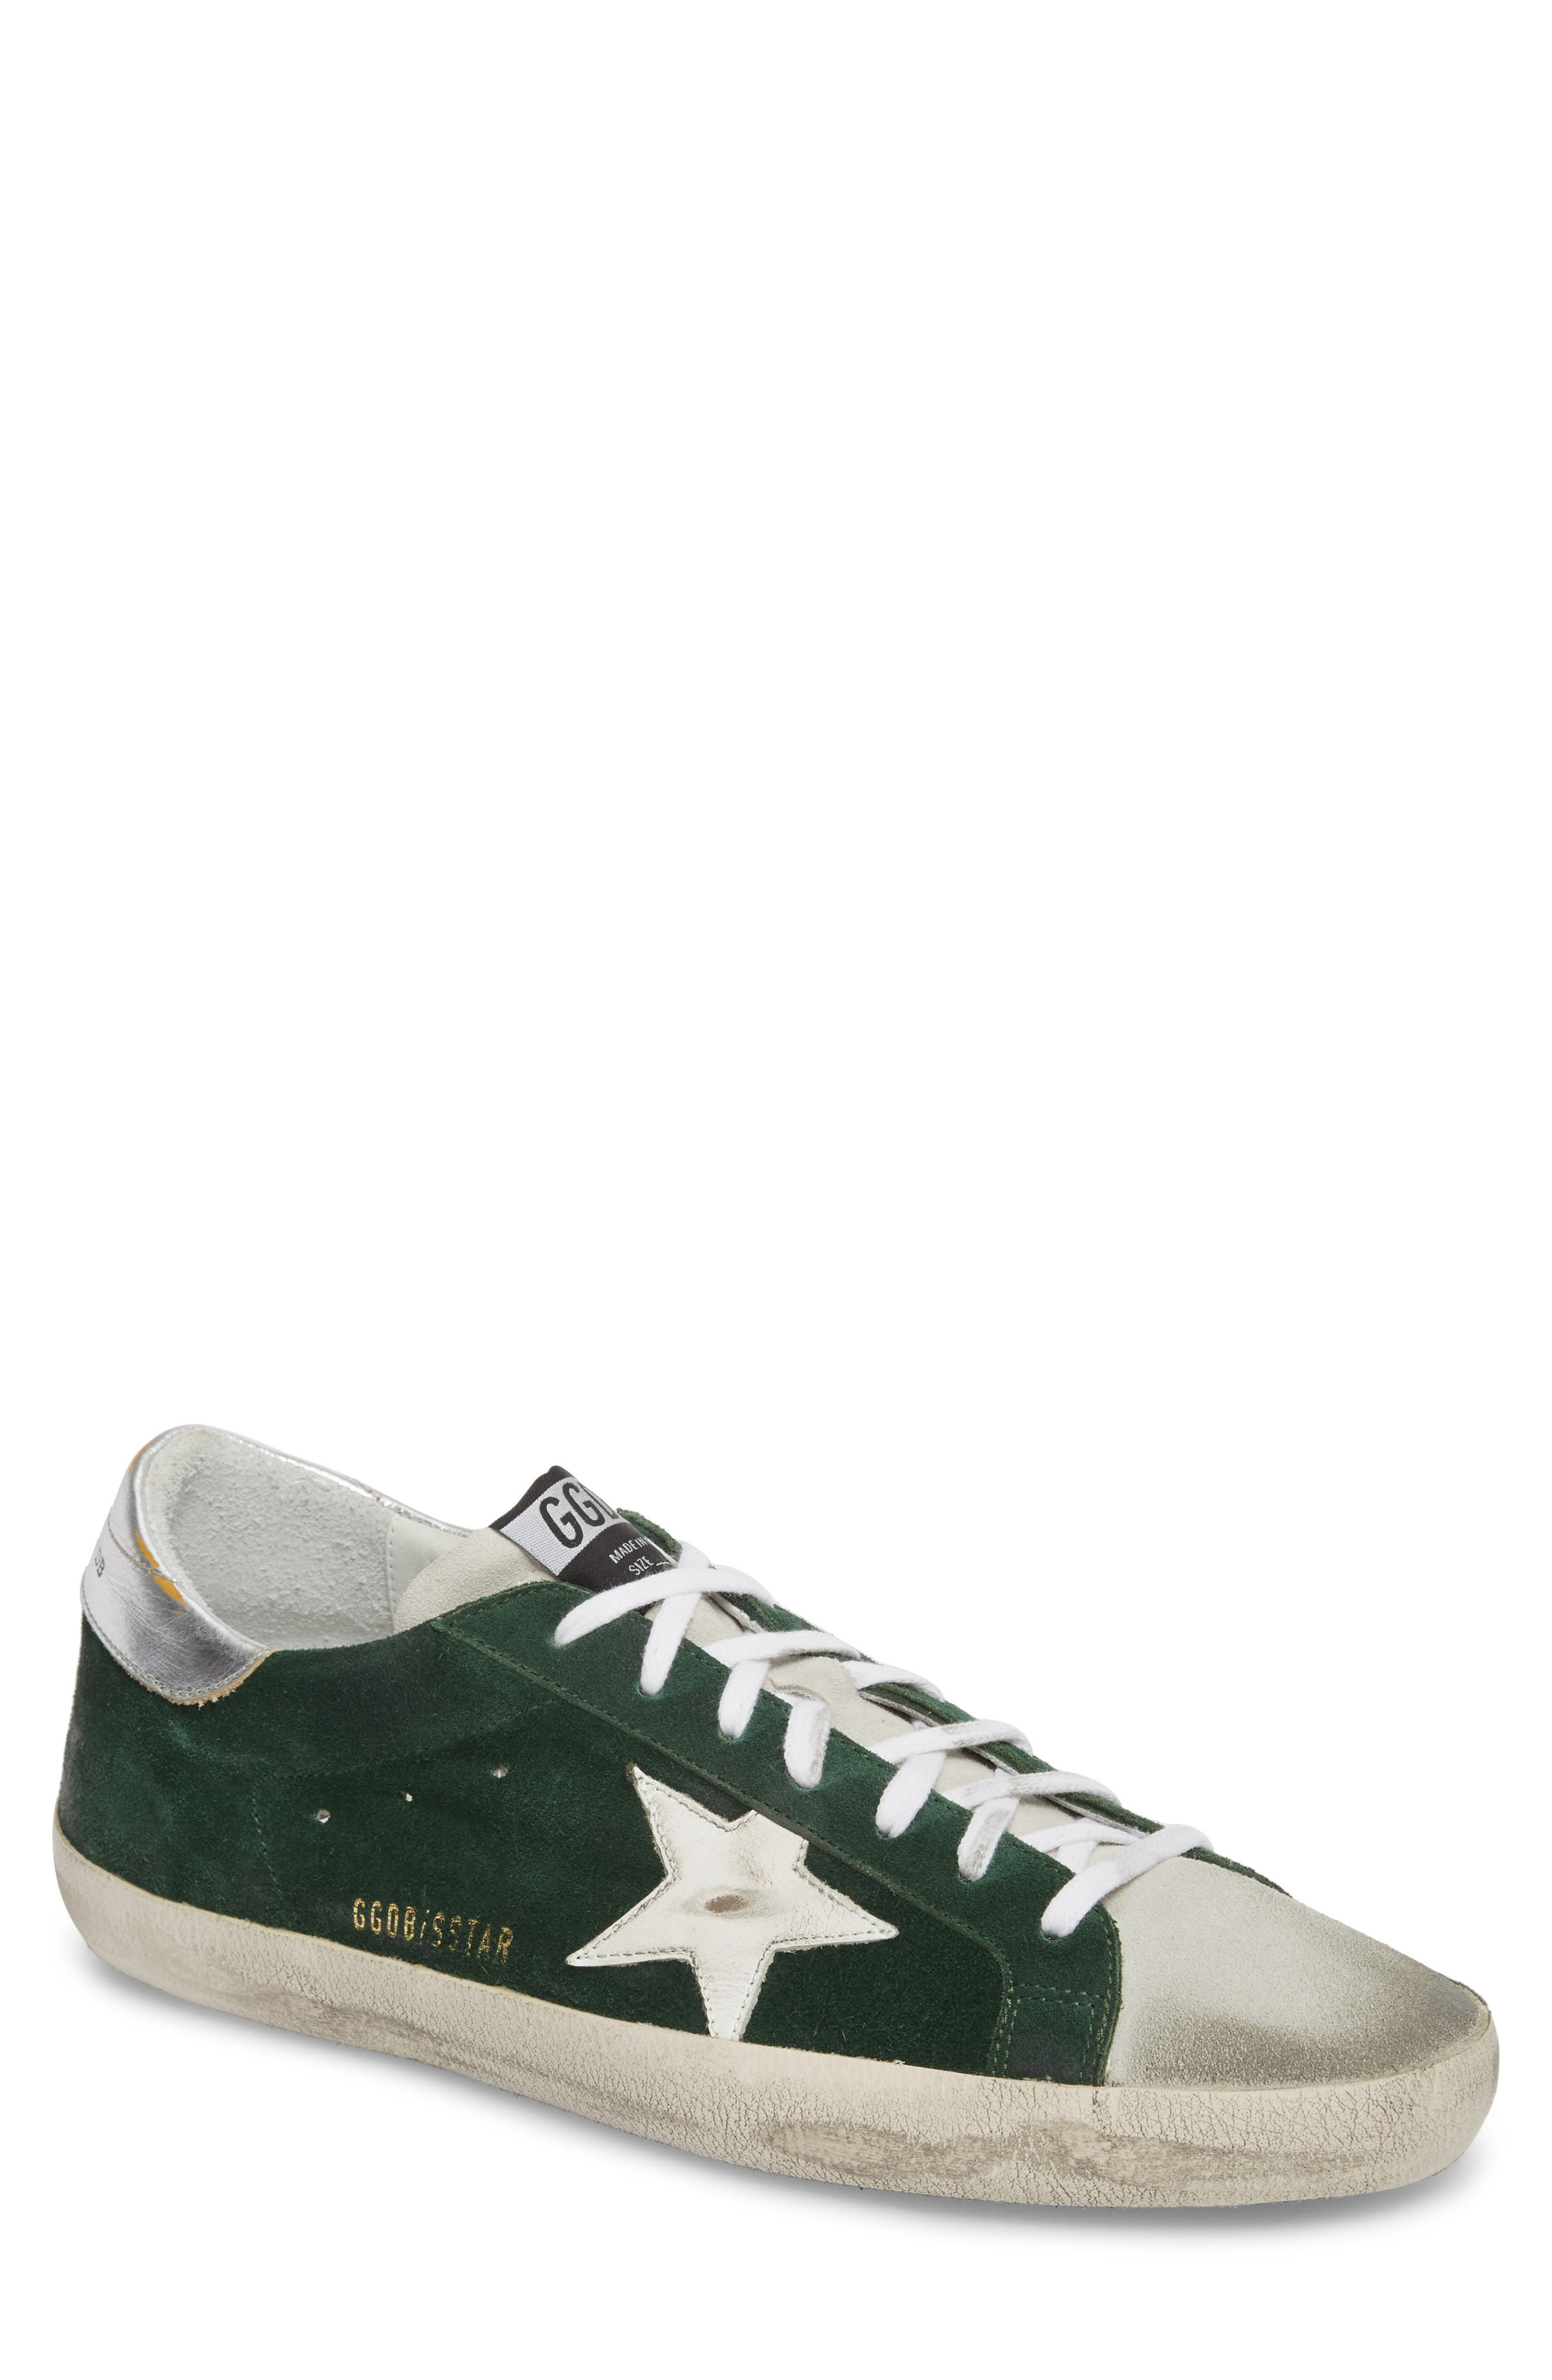 ,                             'Superstar' Sneaker,                             Main thumbnail 85, color,                             300